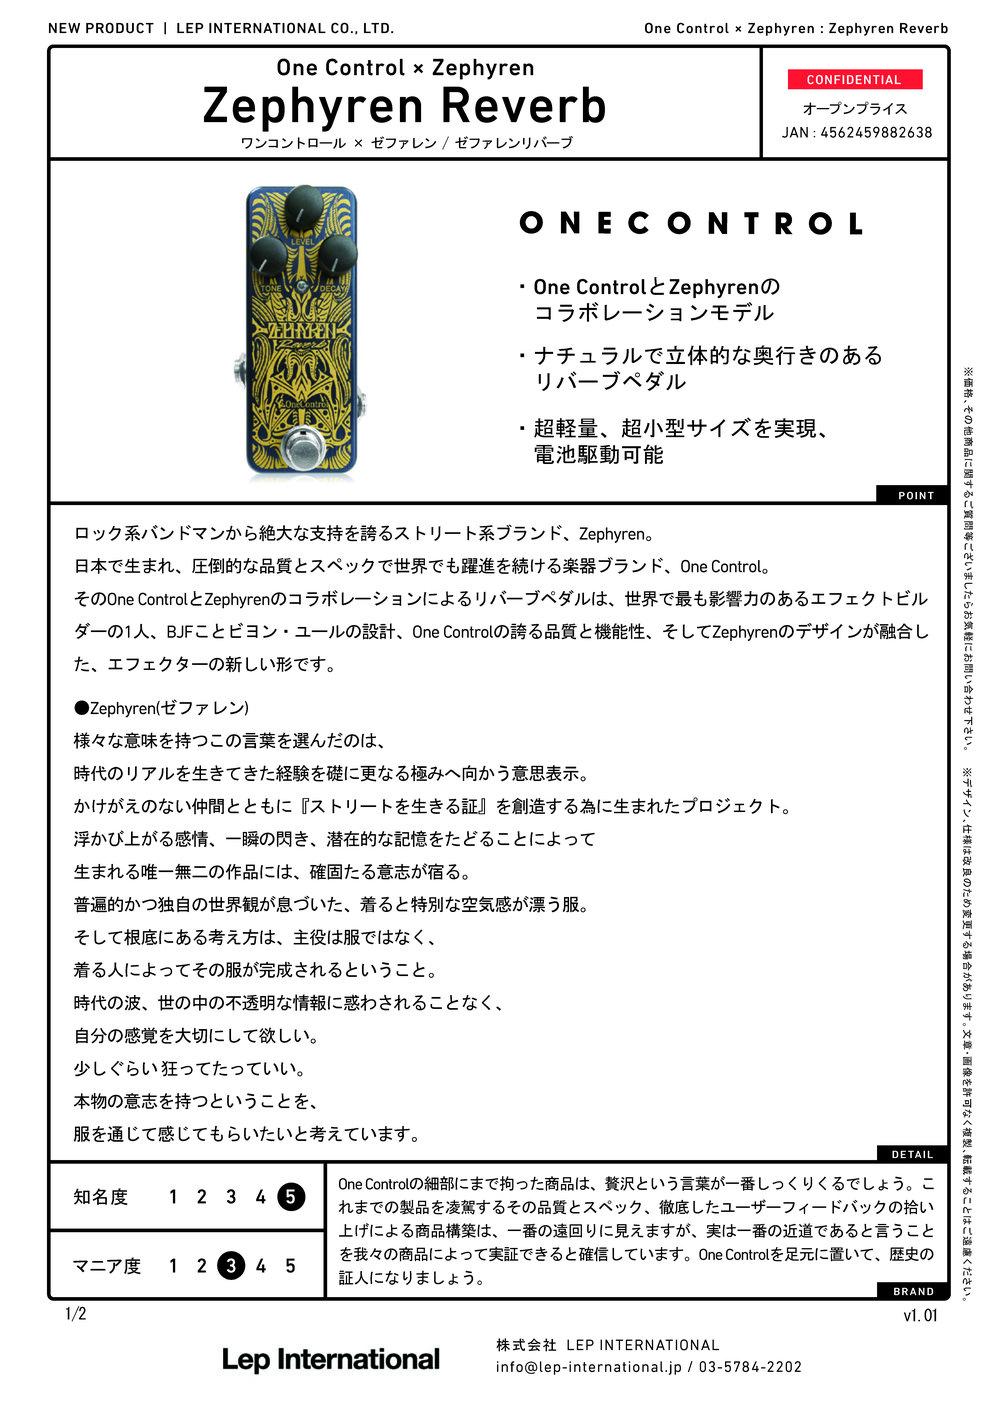 onecontrol×zephyren zephyrenreverb V1.01_ページ_1.jpg